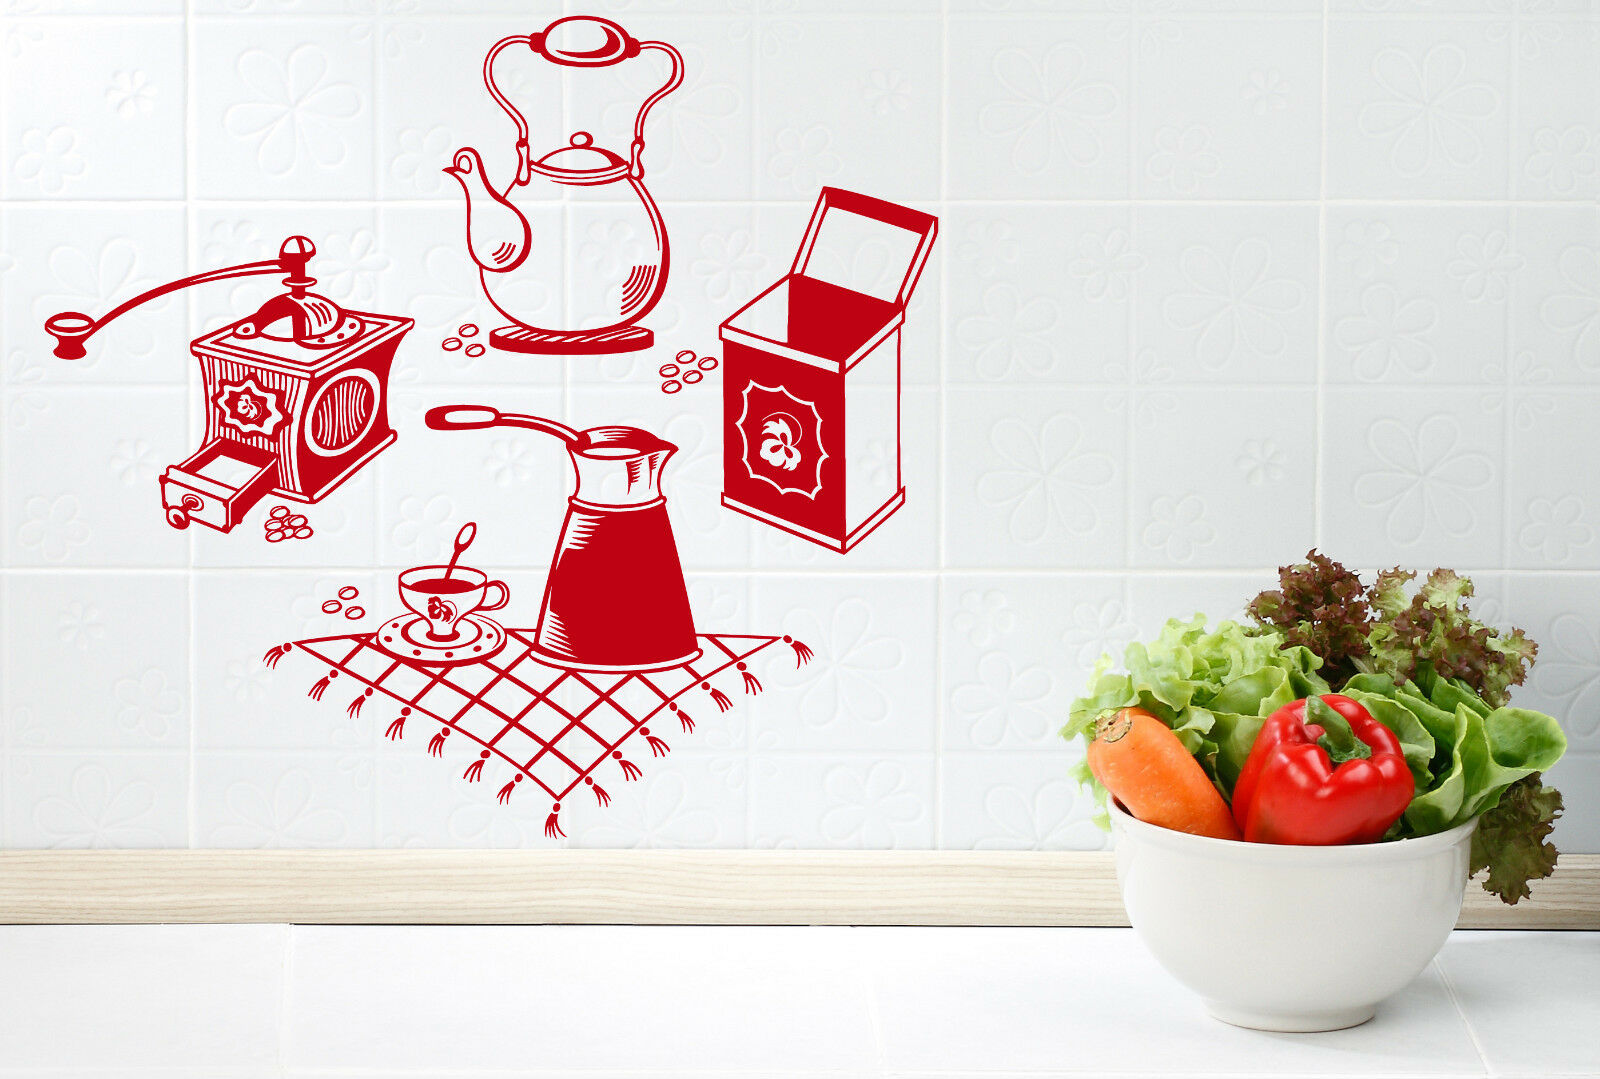 Wall Vinyl Decal Coffee Grinder Maker Tea Maker Kitchen Inte